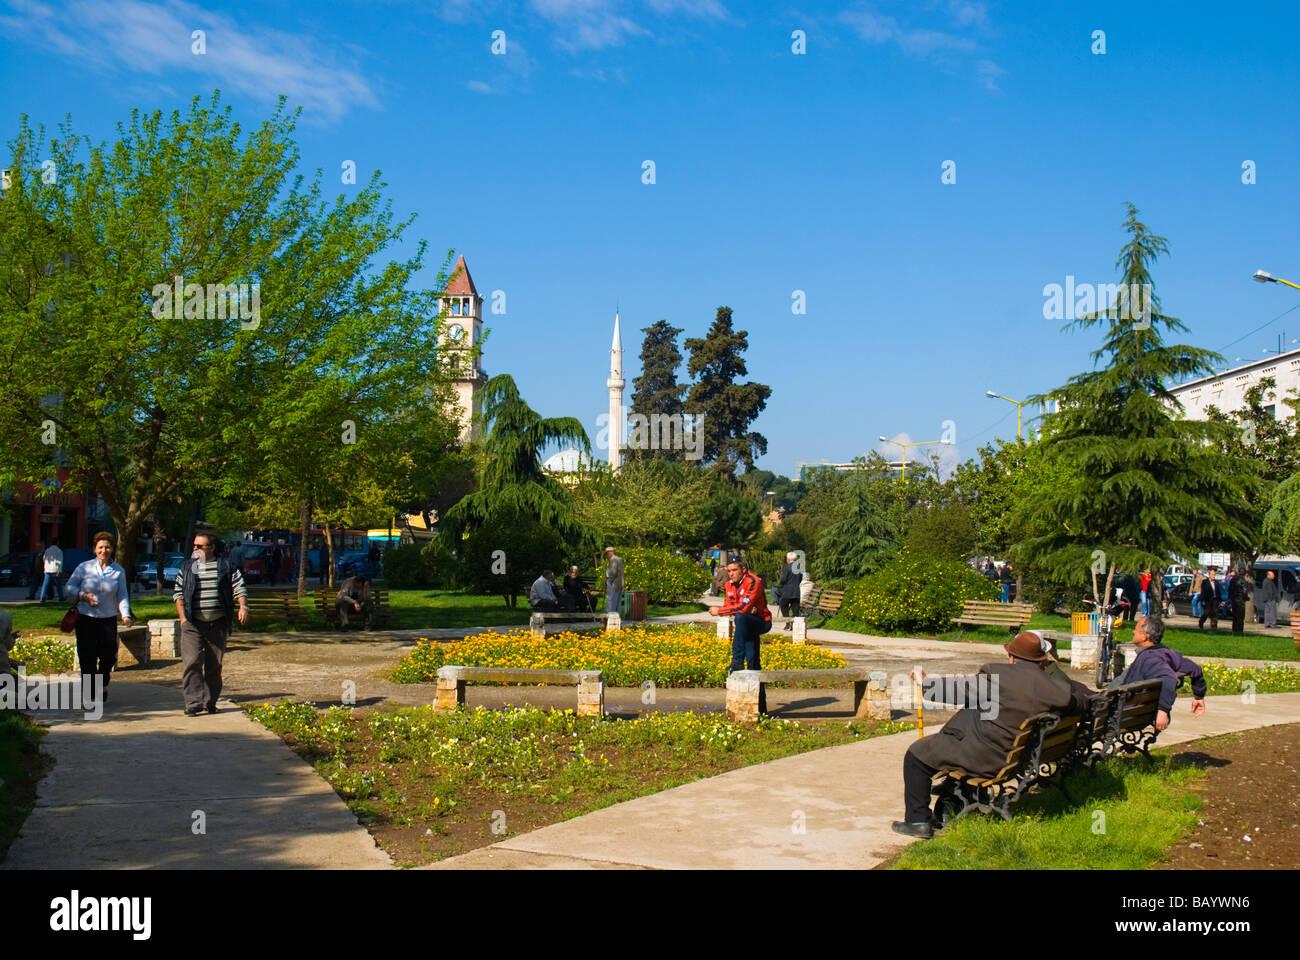 Park in central Tirana Albania Europe - Stock Image